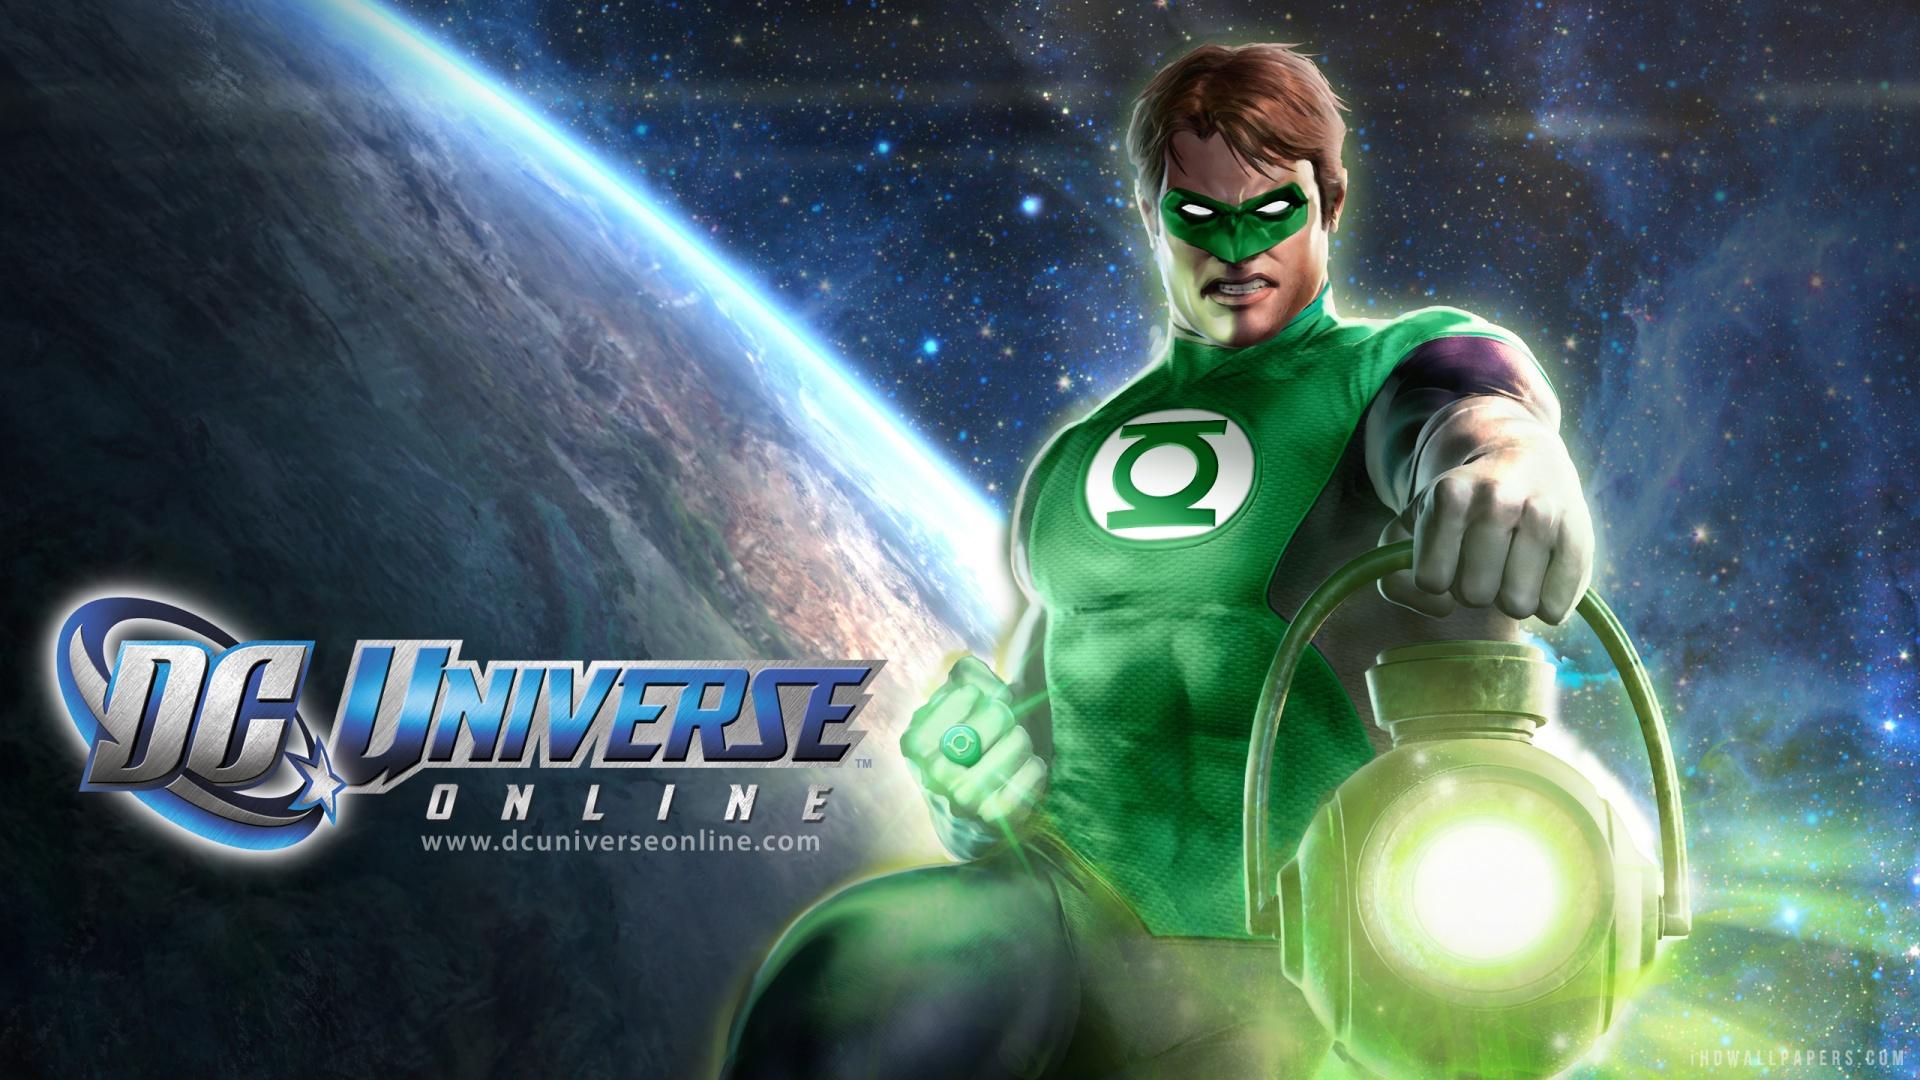 DC Universe Online Green Lantern HD Wallpaper   iHD Wallpapers 1920x1080